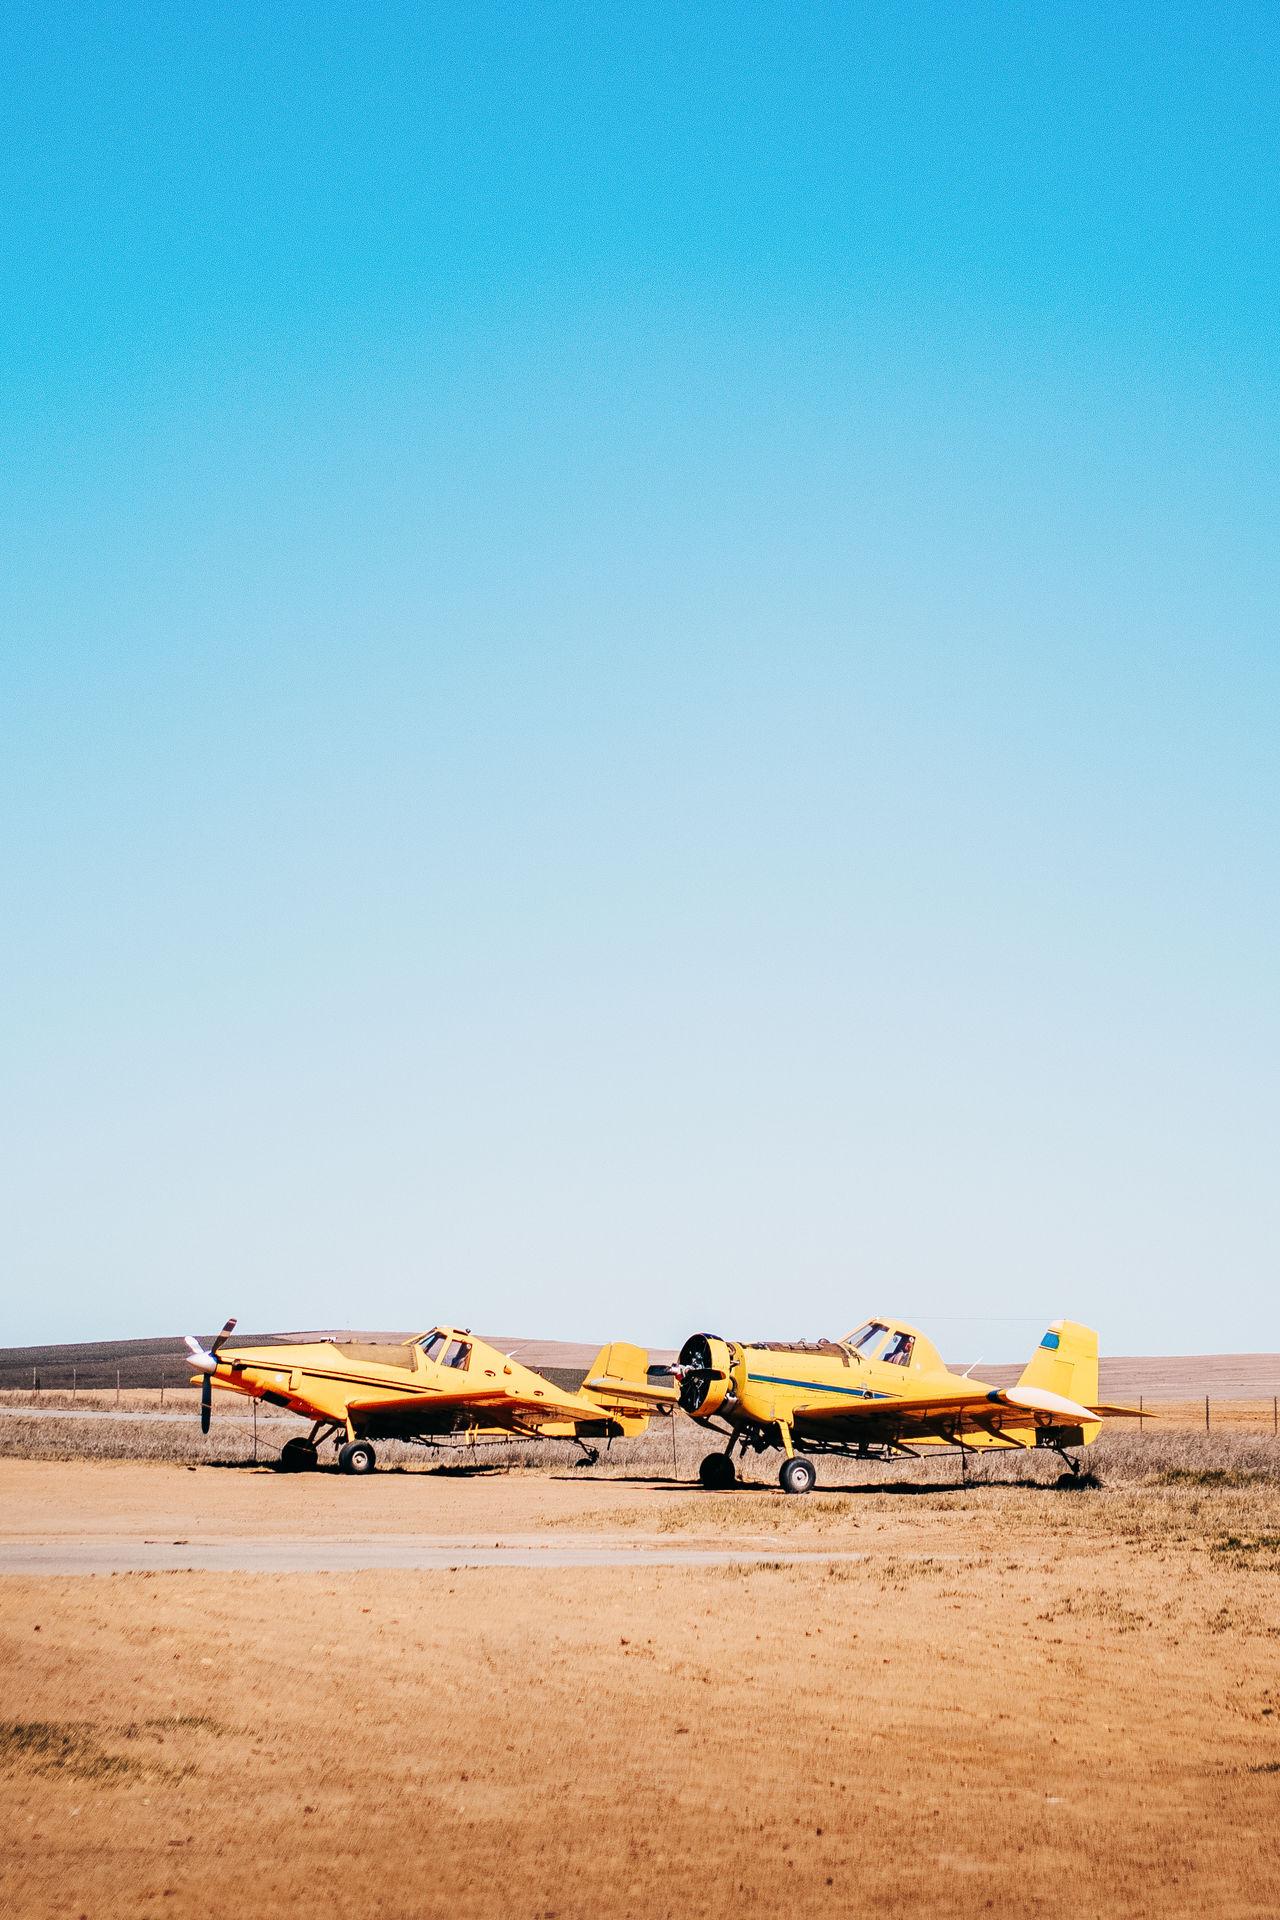 Airplane Blue Clear Sky Copy Space Day Desert Landscape People Plane Sky Transportation